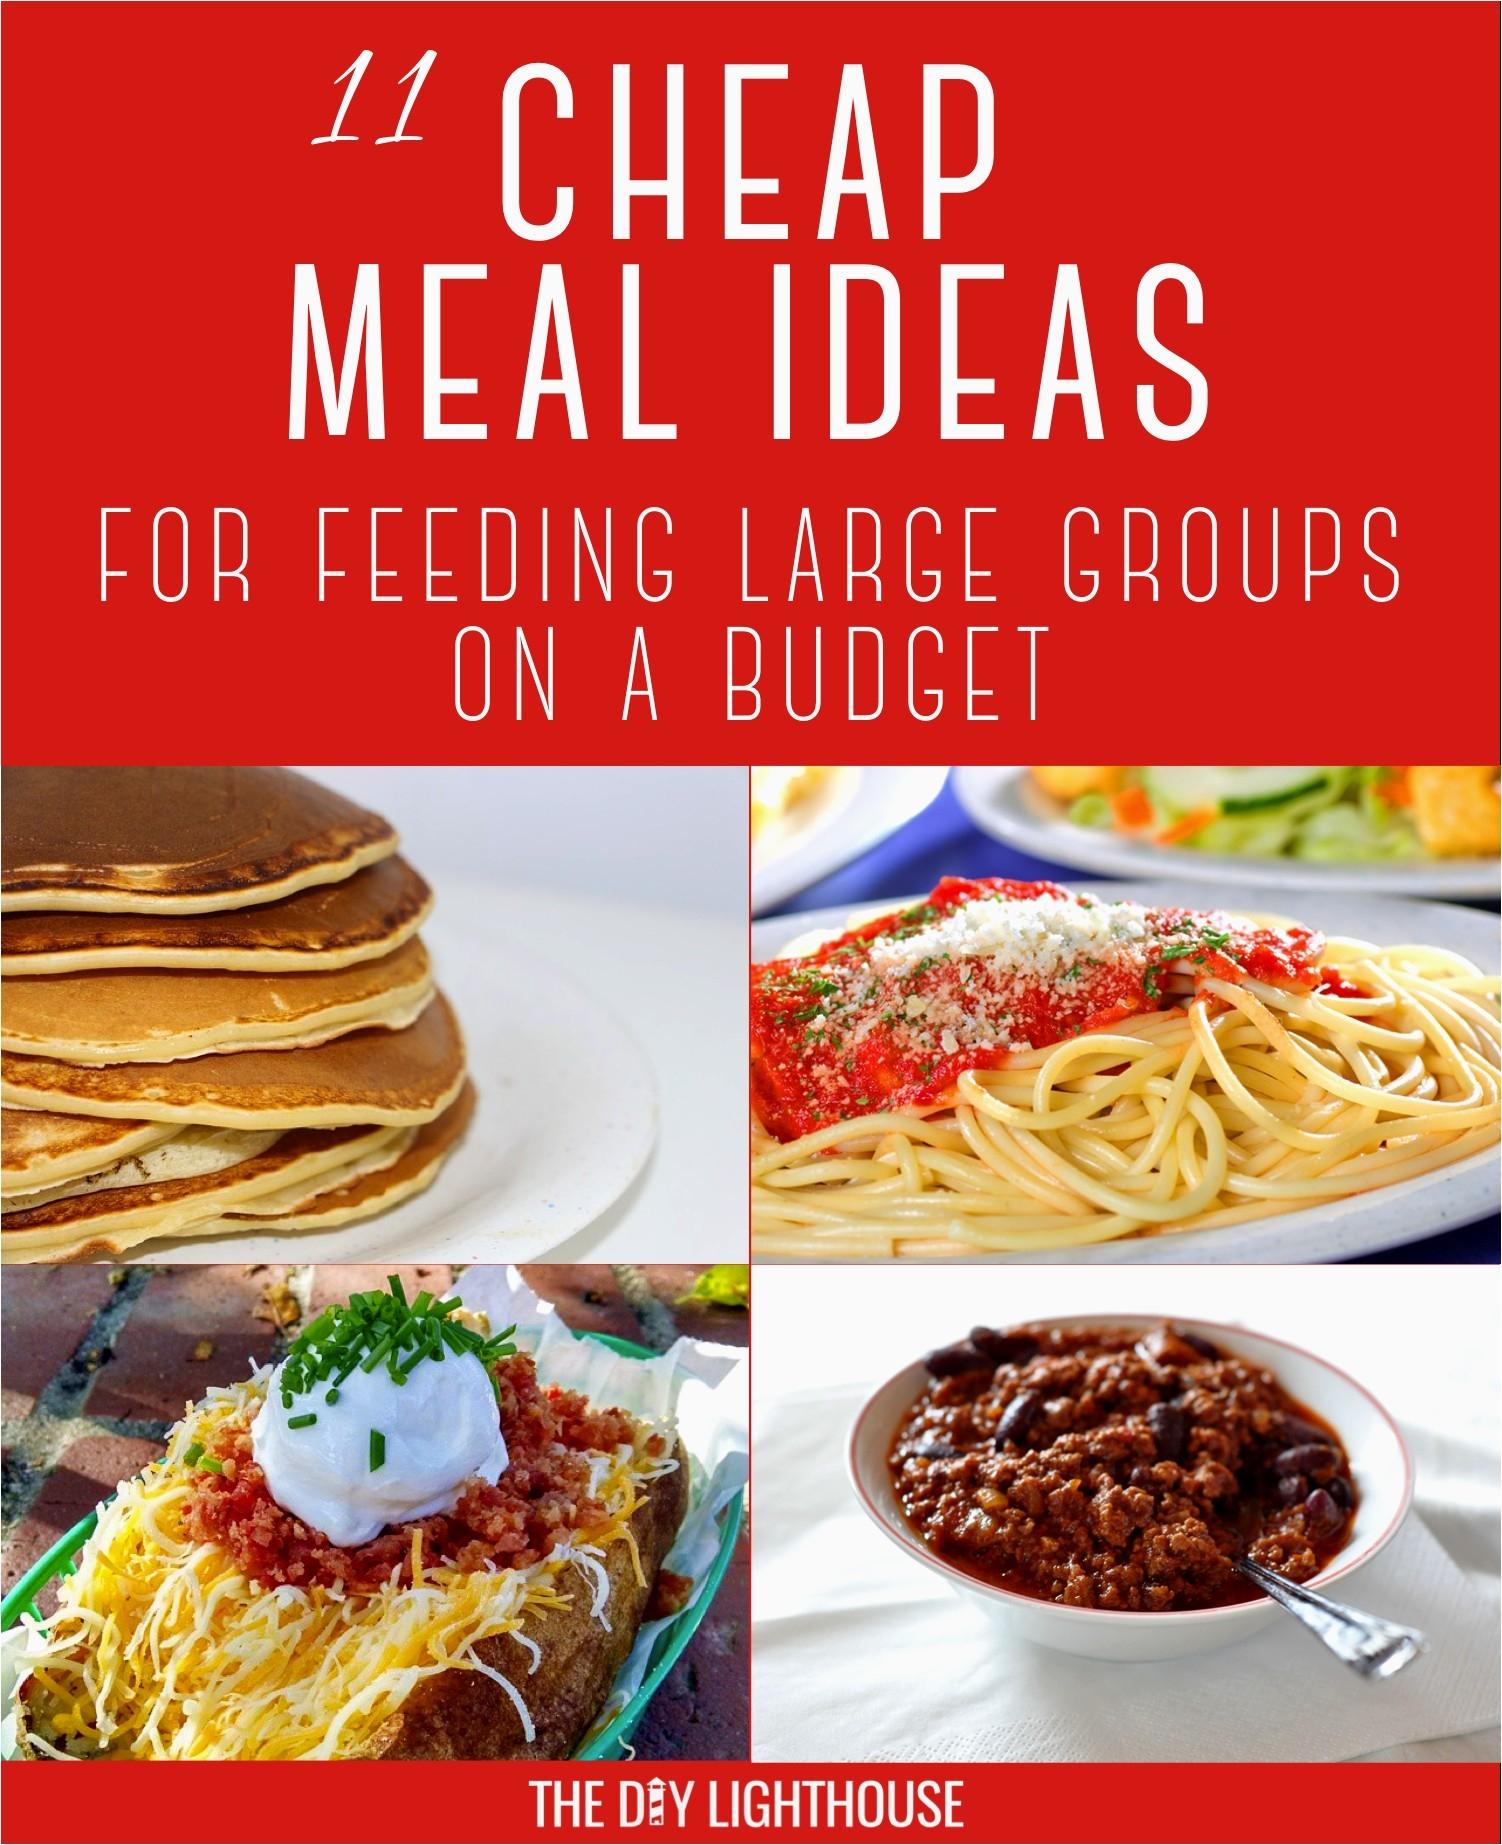 10 Lovable Christmas Dinner Ideas For Large Group 96 christmas food ideas for large groups food from the christmas 2021